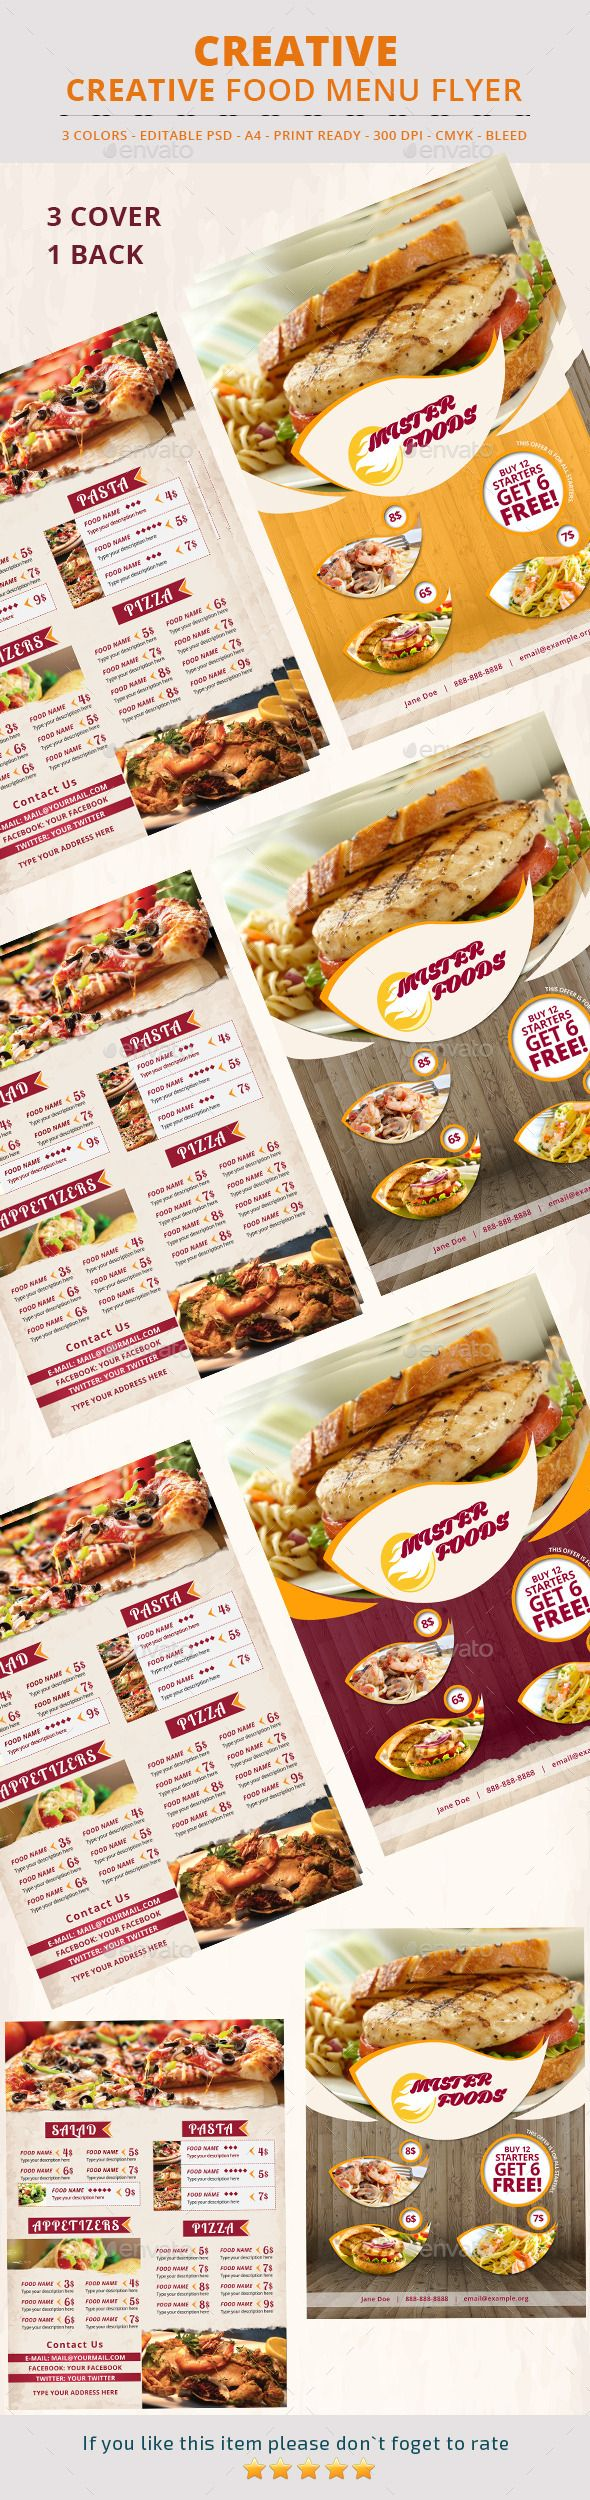 Food Menu Flyer | Grafiken